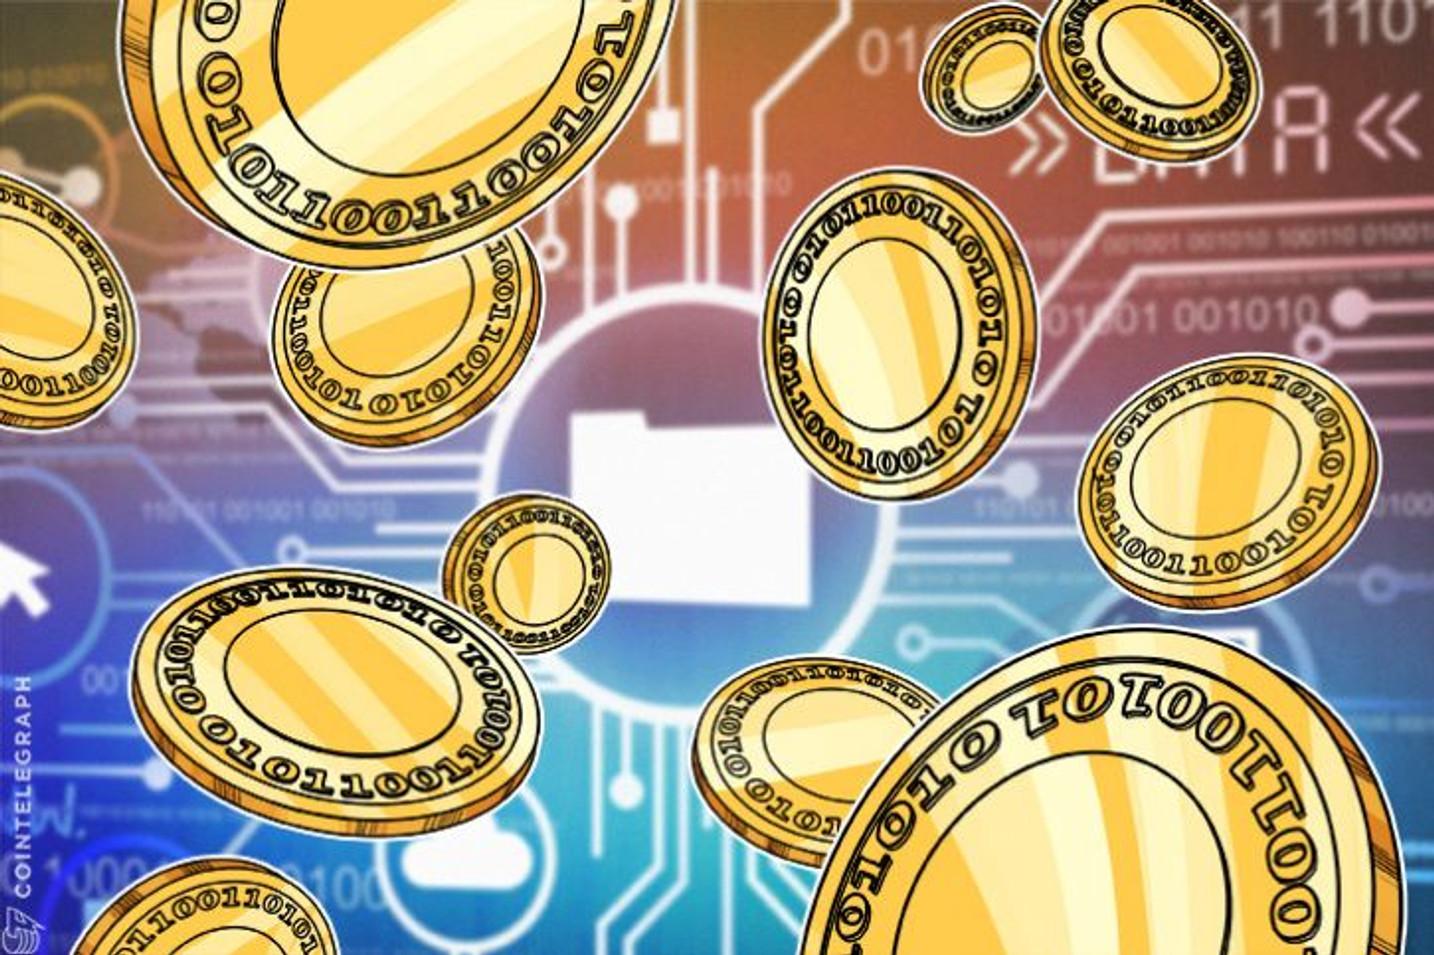 Can Blockchain Help Democratize Online Content Economy?